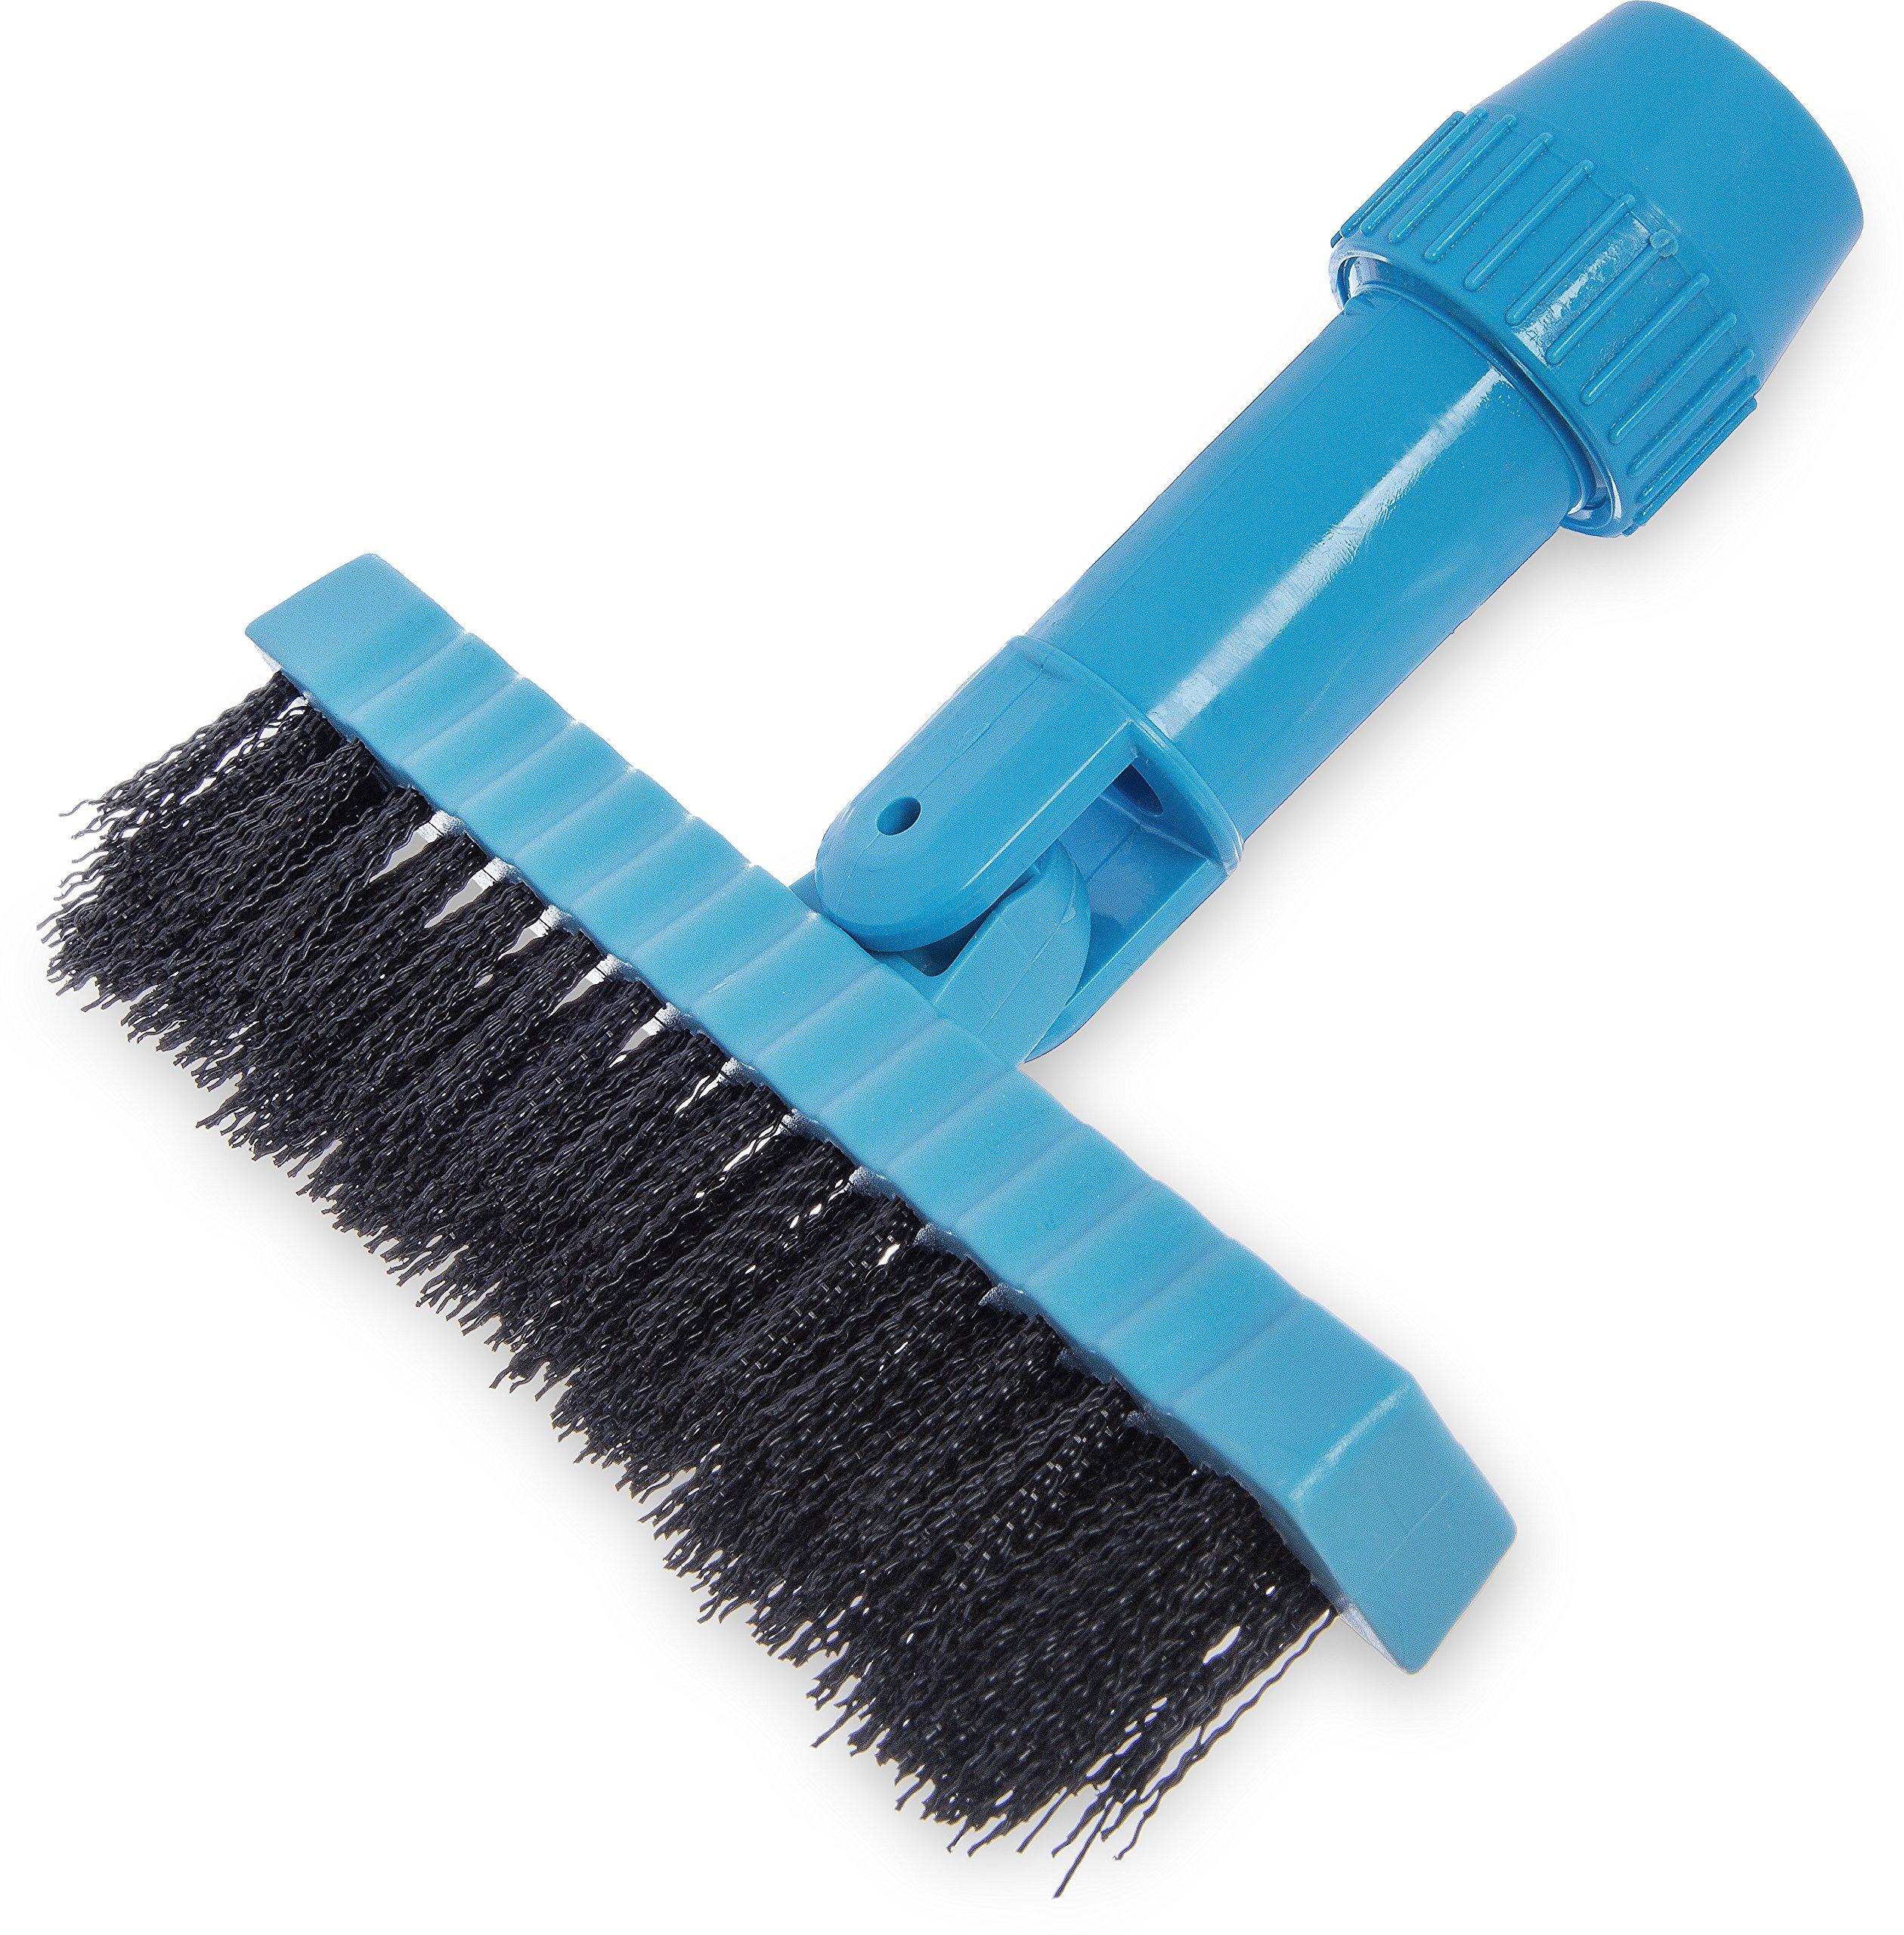 Carlisle 36532003 Swivel-Head Grout Line Brush, 1-1/4''-Long Black Crimped Nylon Bristles, Blue Block, 7-1/2'' L x 1'' W (Case of 12)